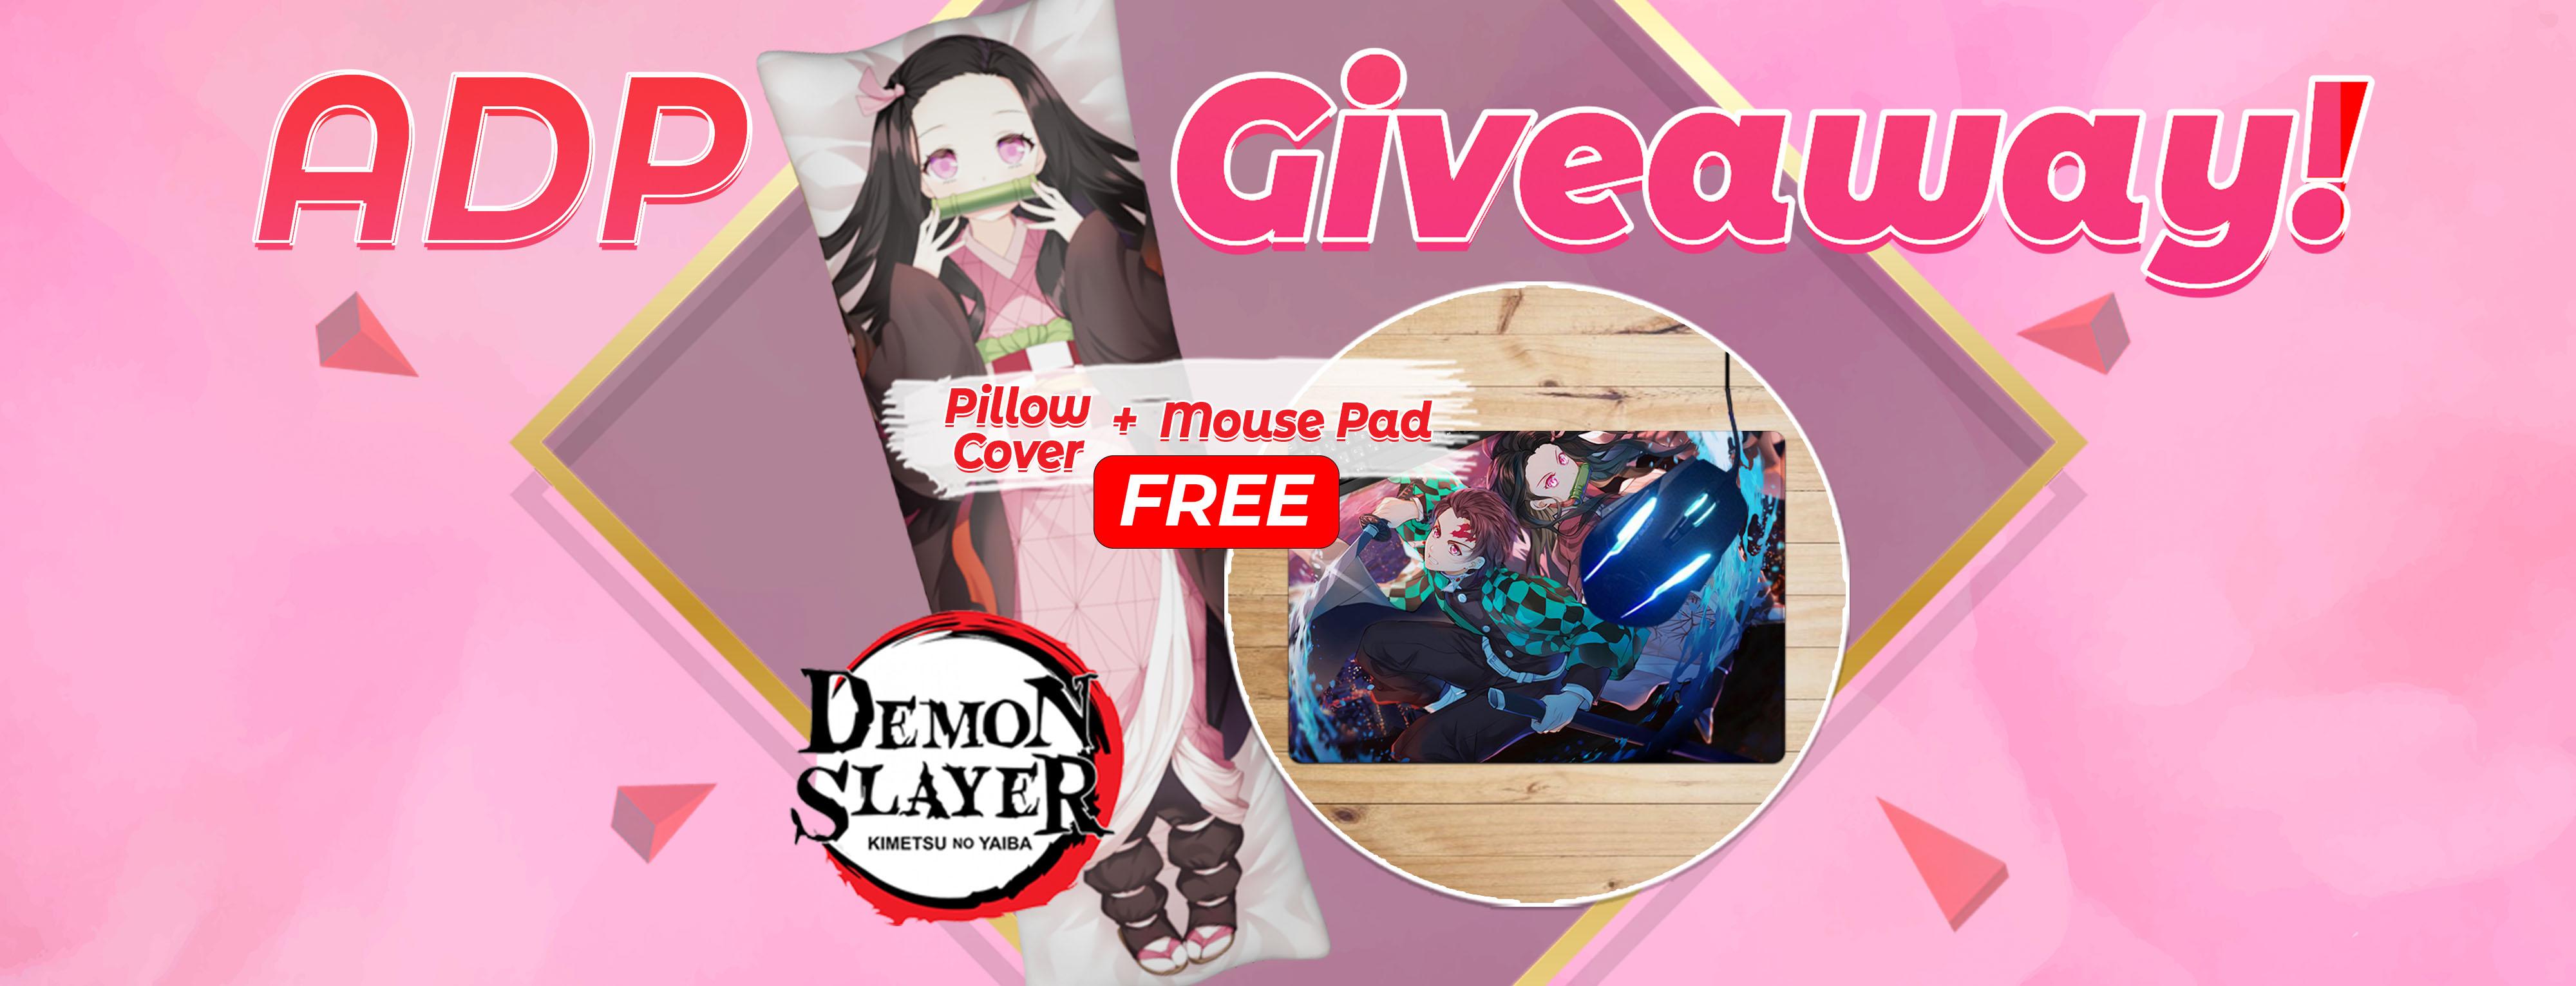 ADP Demon Slayer Giveaway